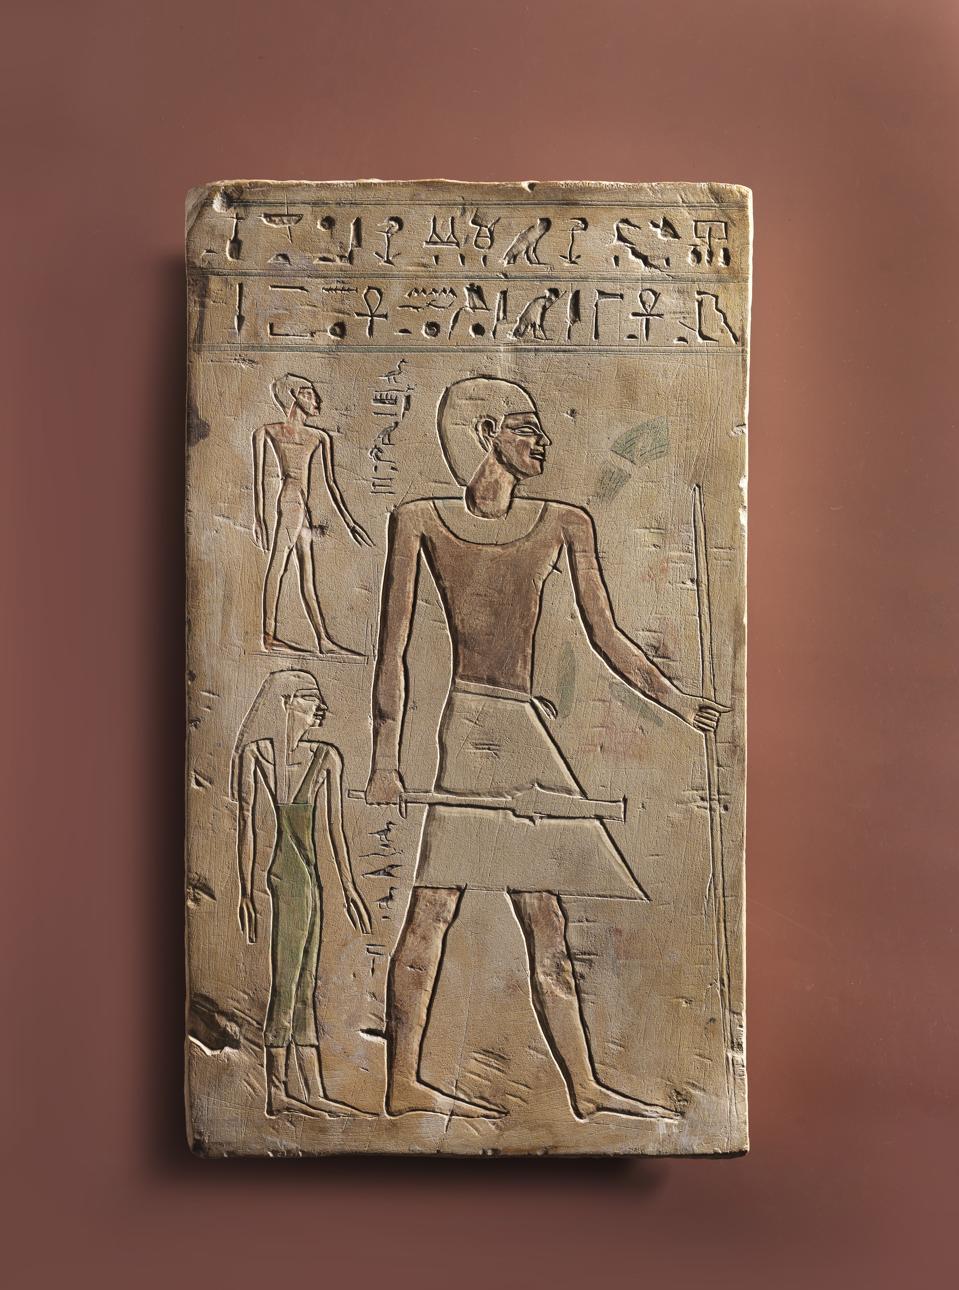 Funerary stela of Nekhetankh. Middle Kingdom, early 12th Dynasty (20th century BCE). Painted limestone. H 47, W 27. Harry Stern Collection, bequest of Kurt Stern, London. 76.14.867.